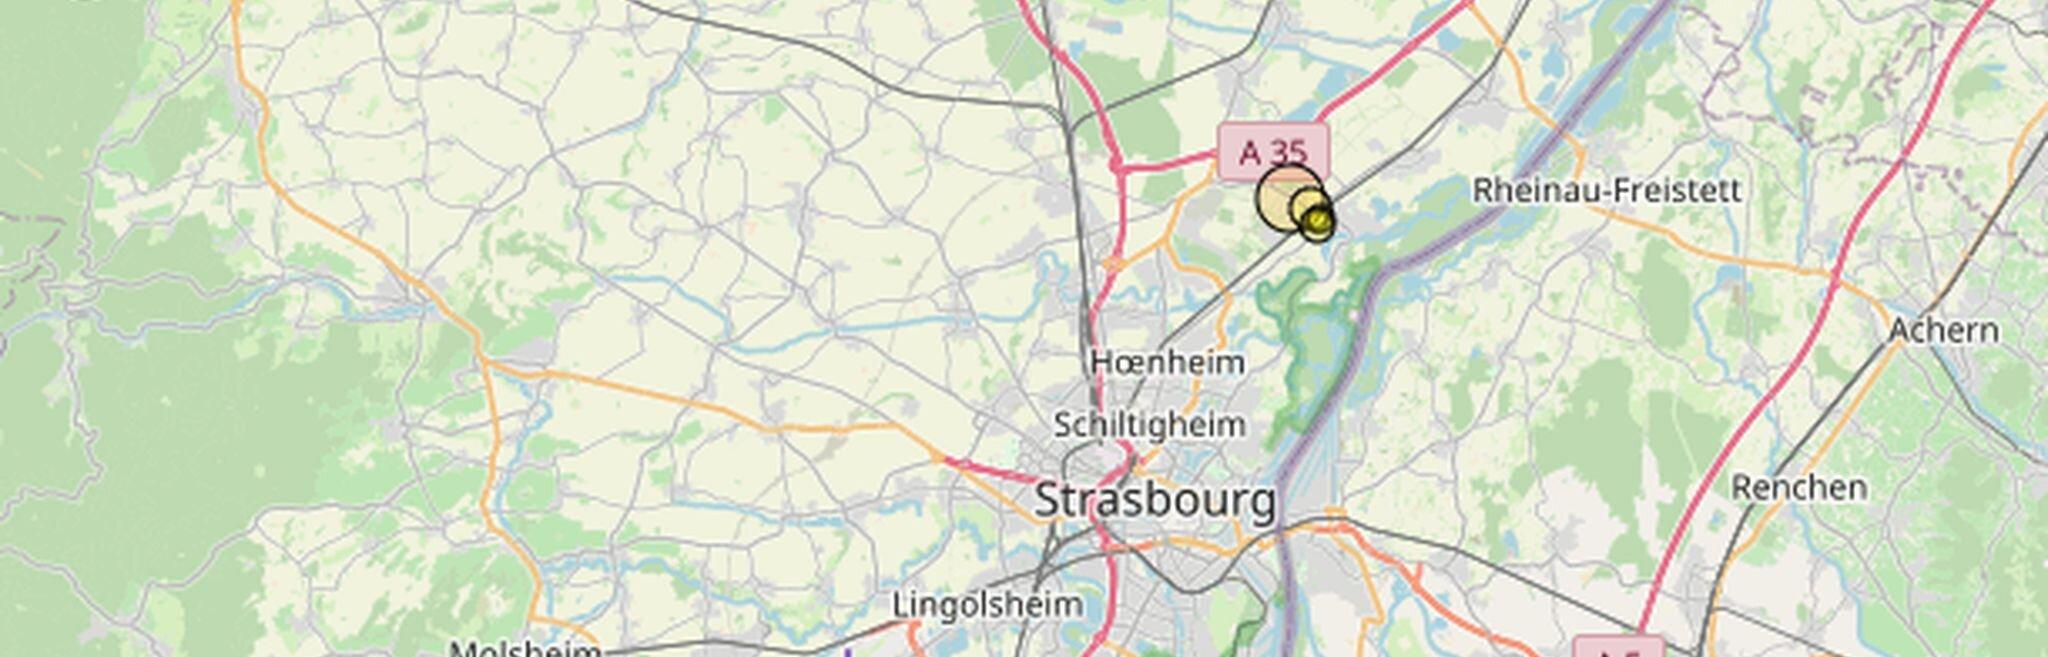 Séisme de magnitude 3,6 au nord de Strasbourg vendredi soir